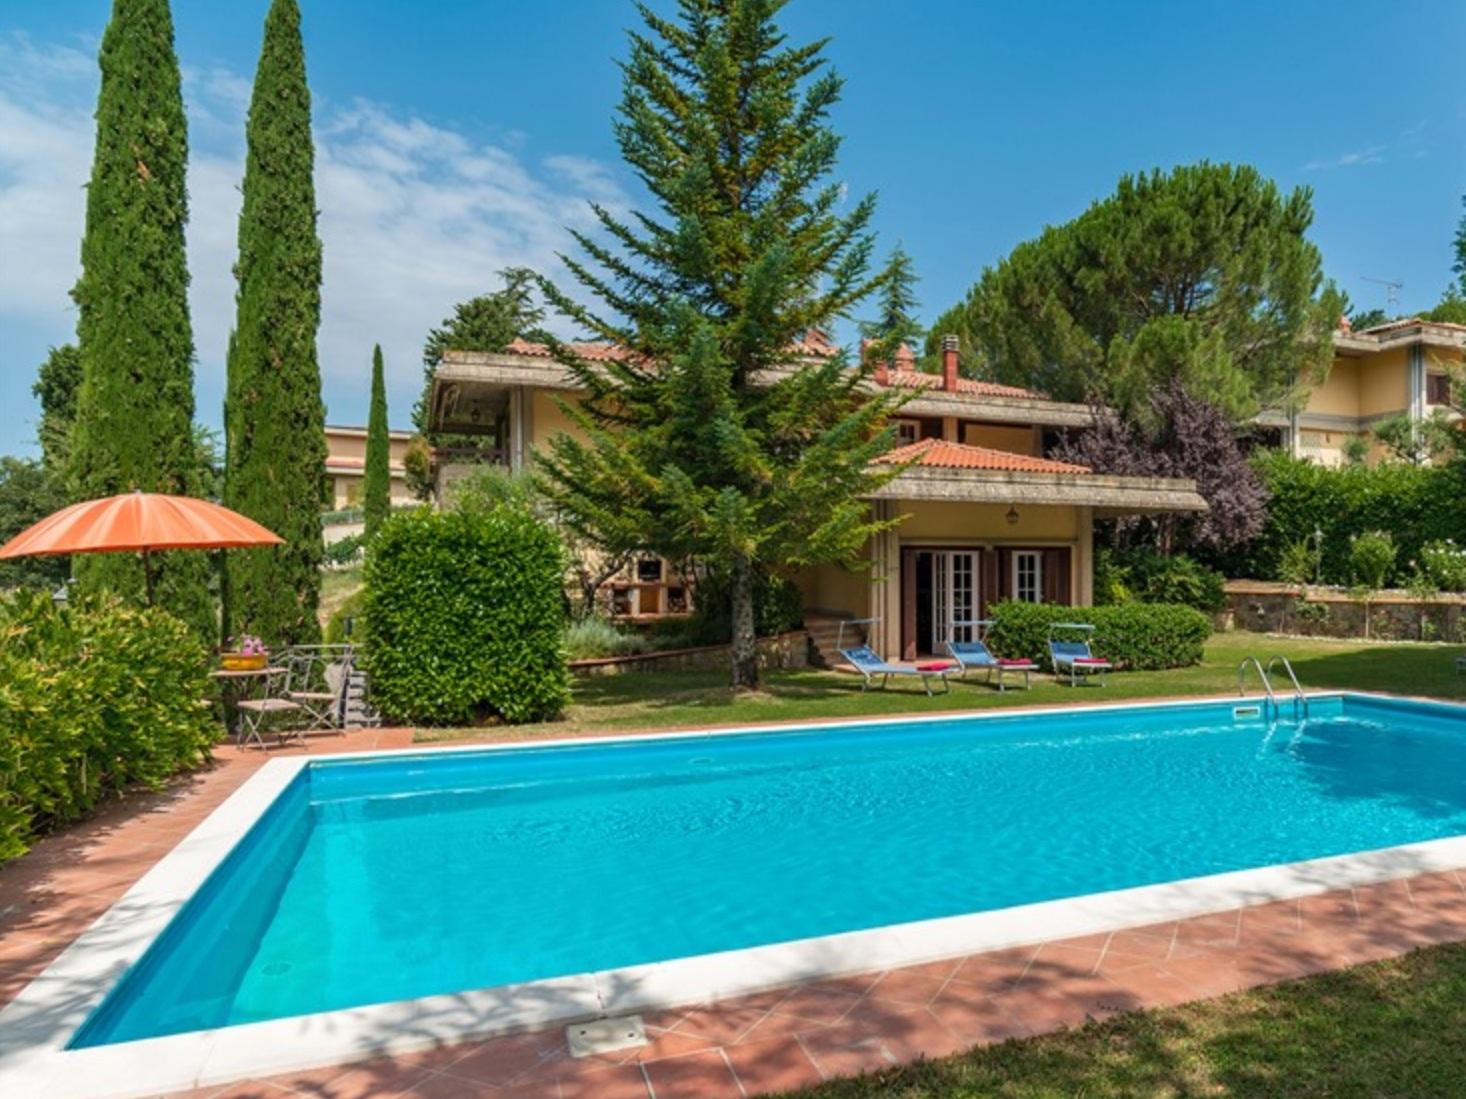 CHIANTI VILLA - GREVE IN CHIANTI - 4 BEDROOMS - 4 BATHWEEKLY PRICE FROM €1,700